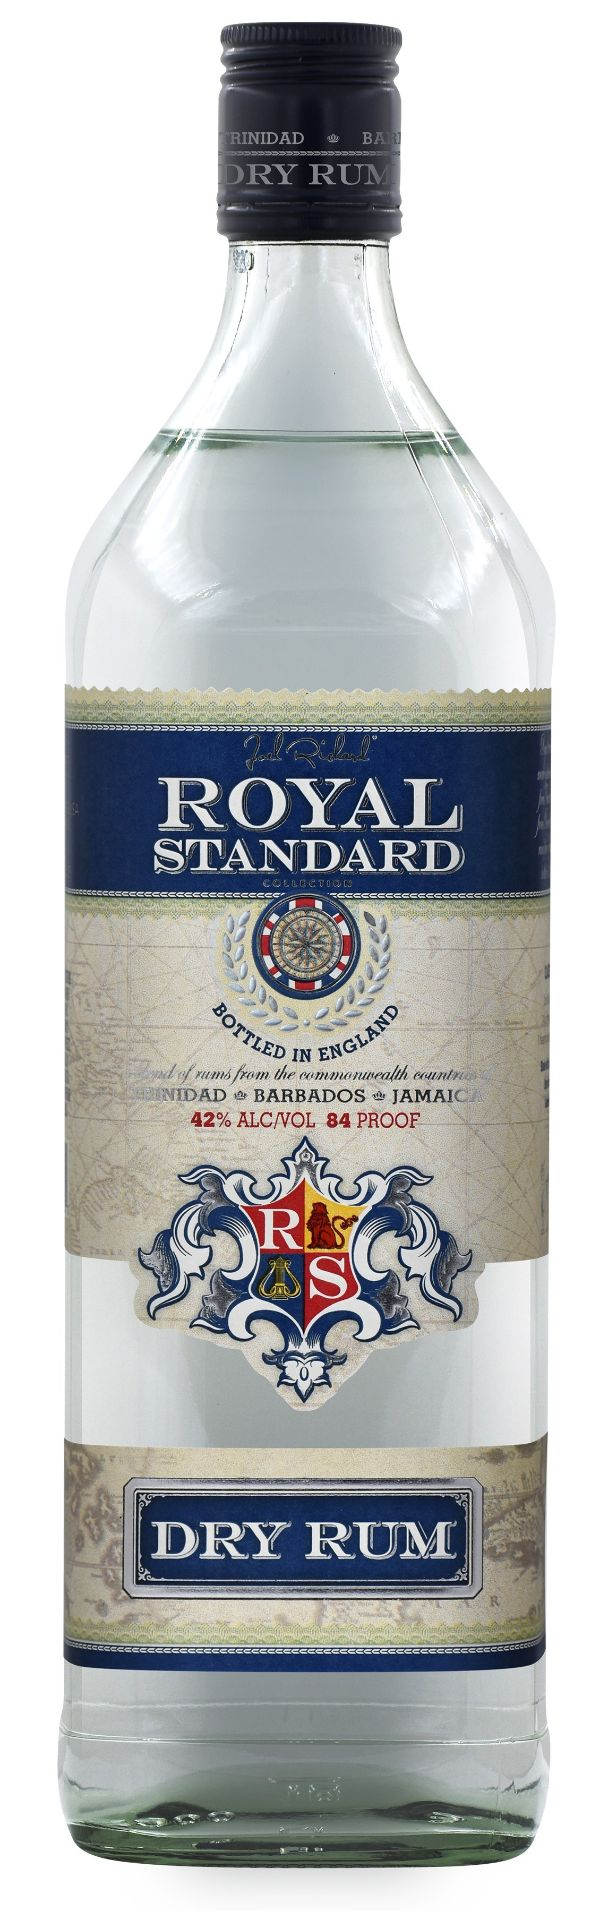 Royal Standard Dry Rum